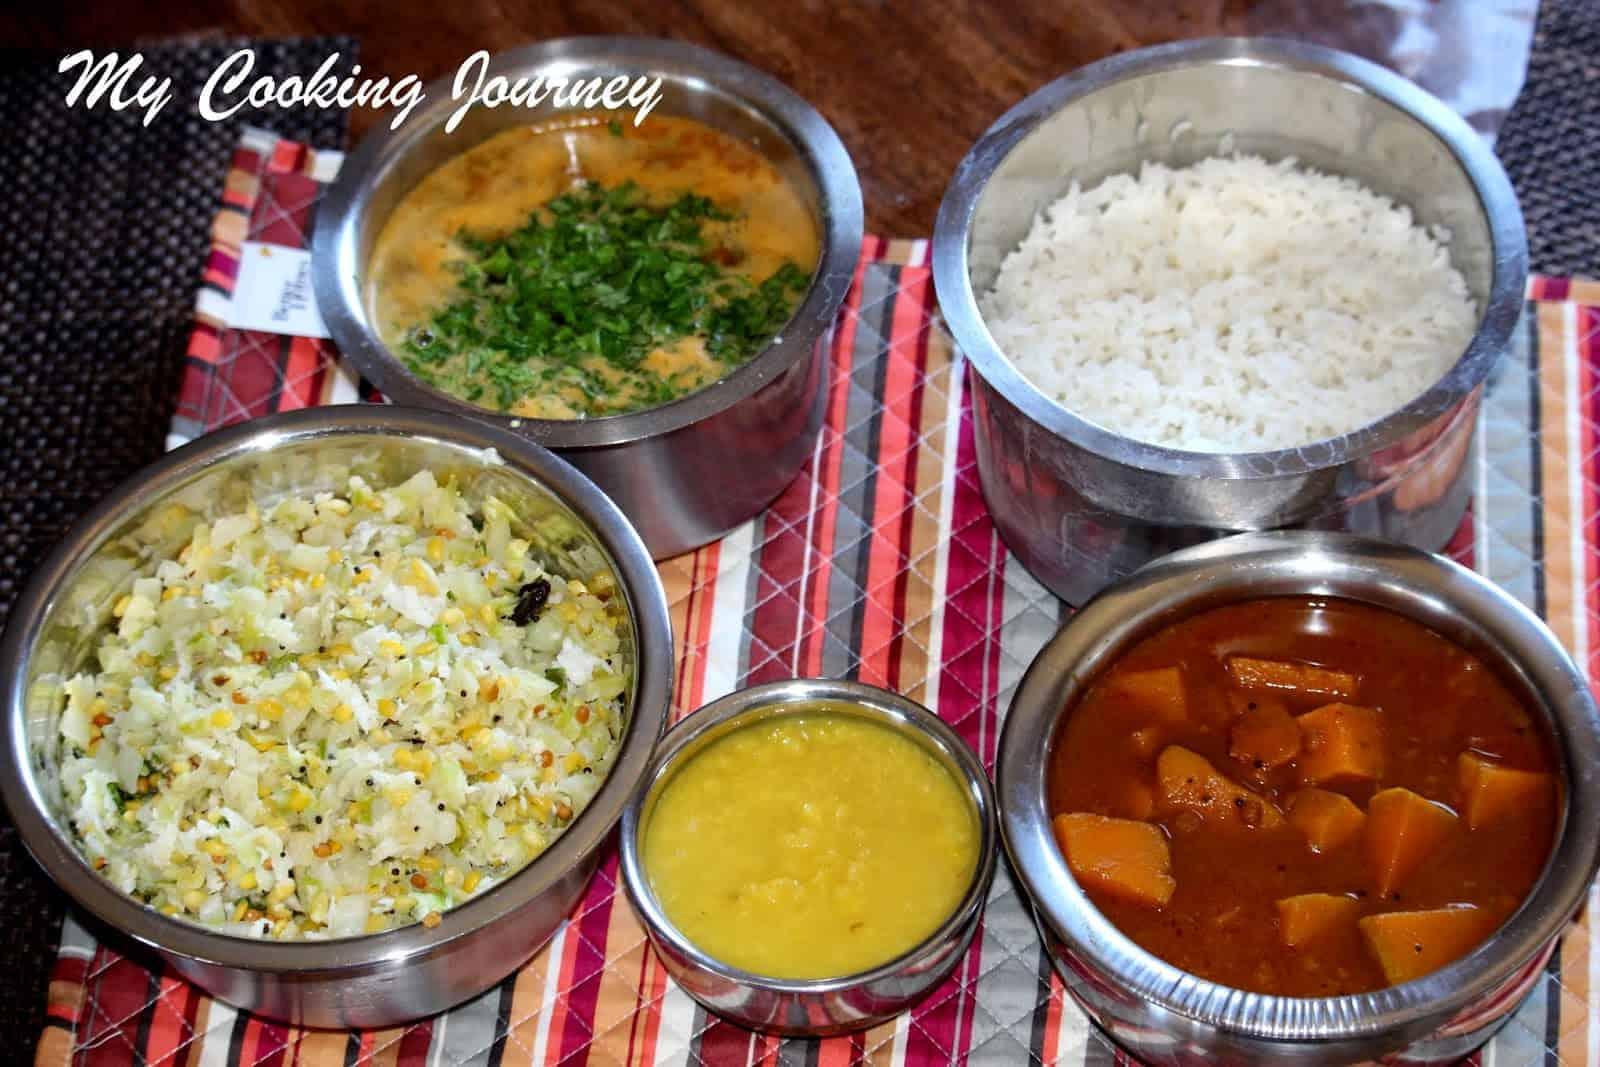 South Indian Lunch Menu # 1 – Pumpkin Vathal Kuzhambu, Cabbage Curry and Tomato Rasam